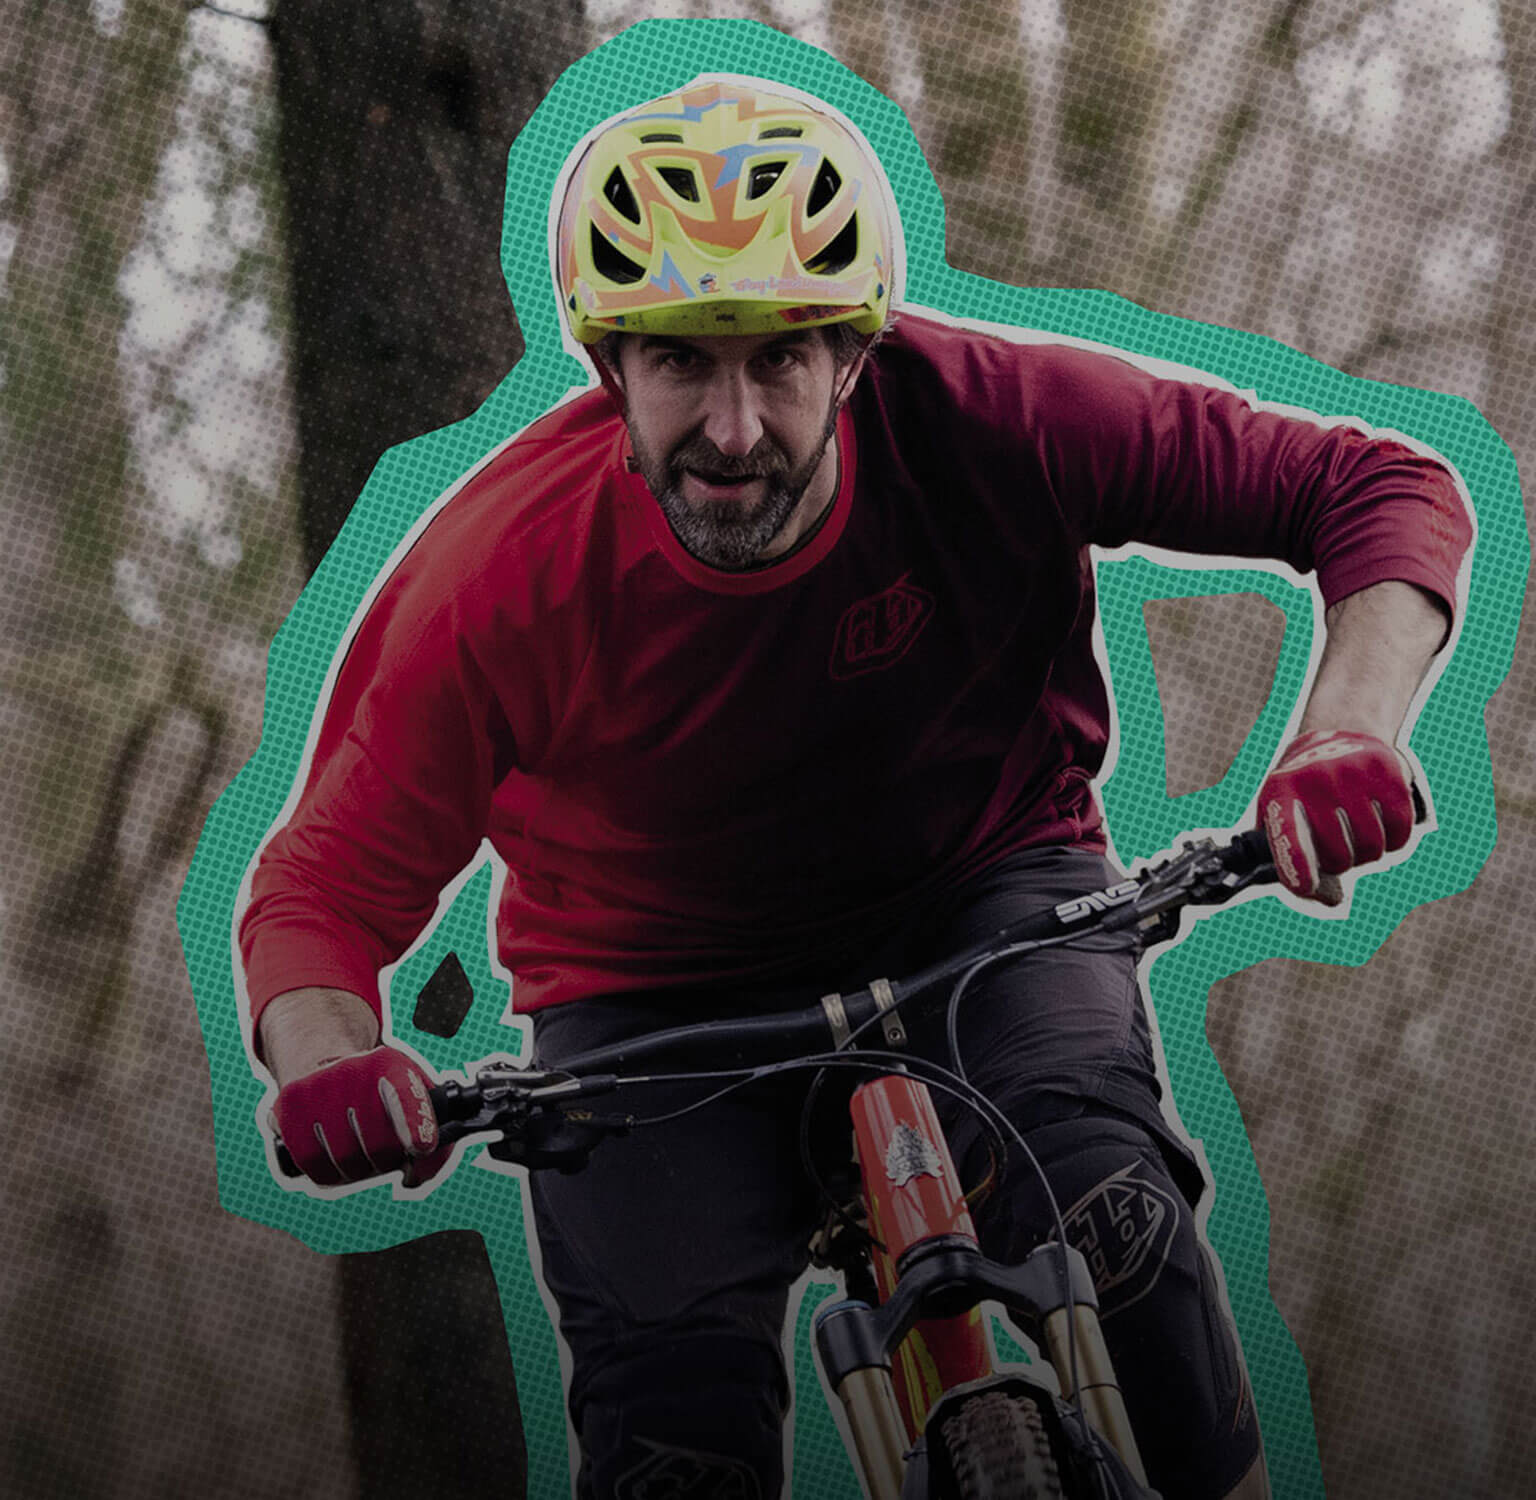 MTB cycle insurance home tablet DE